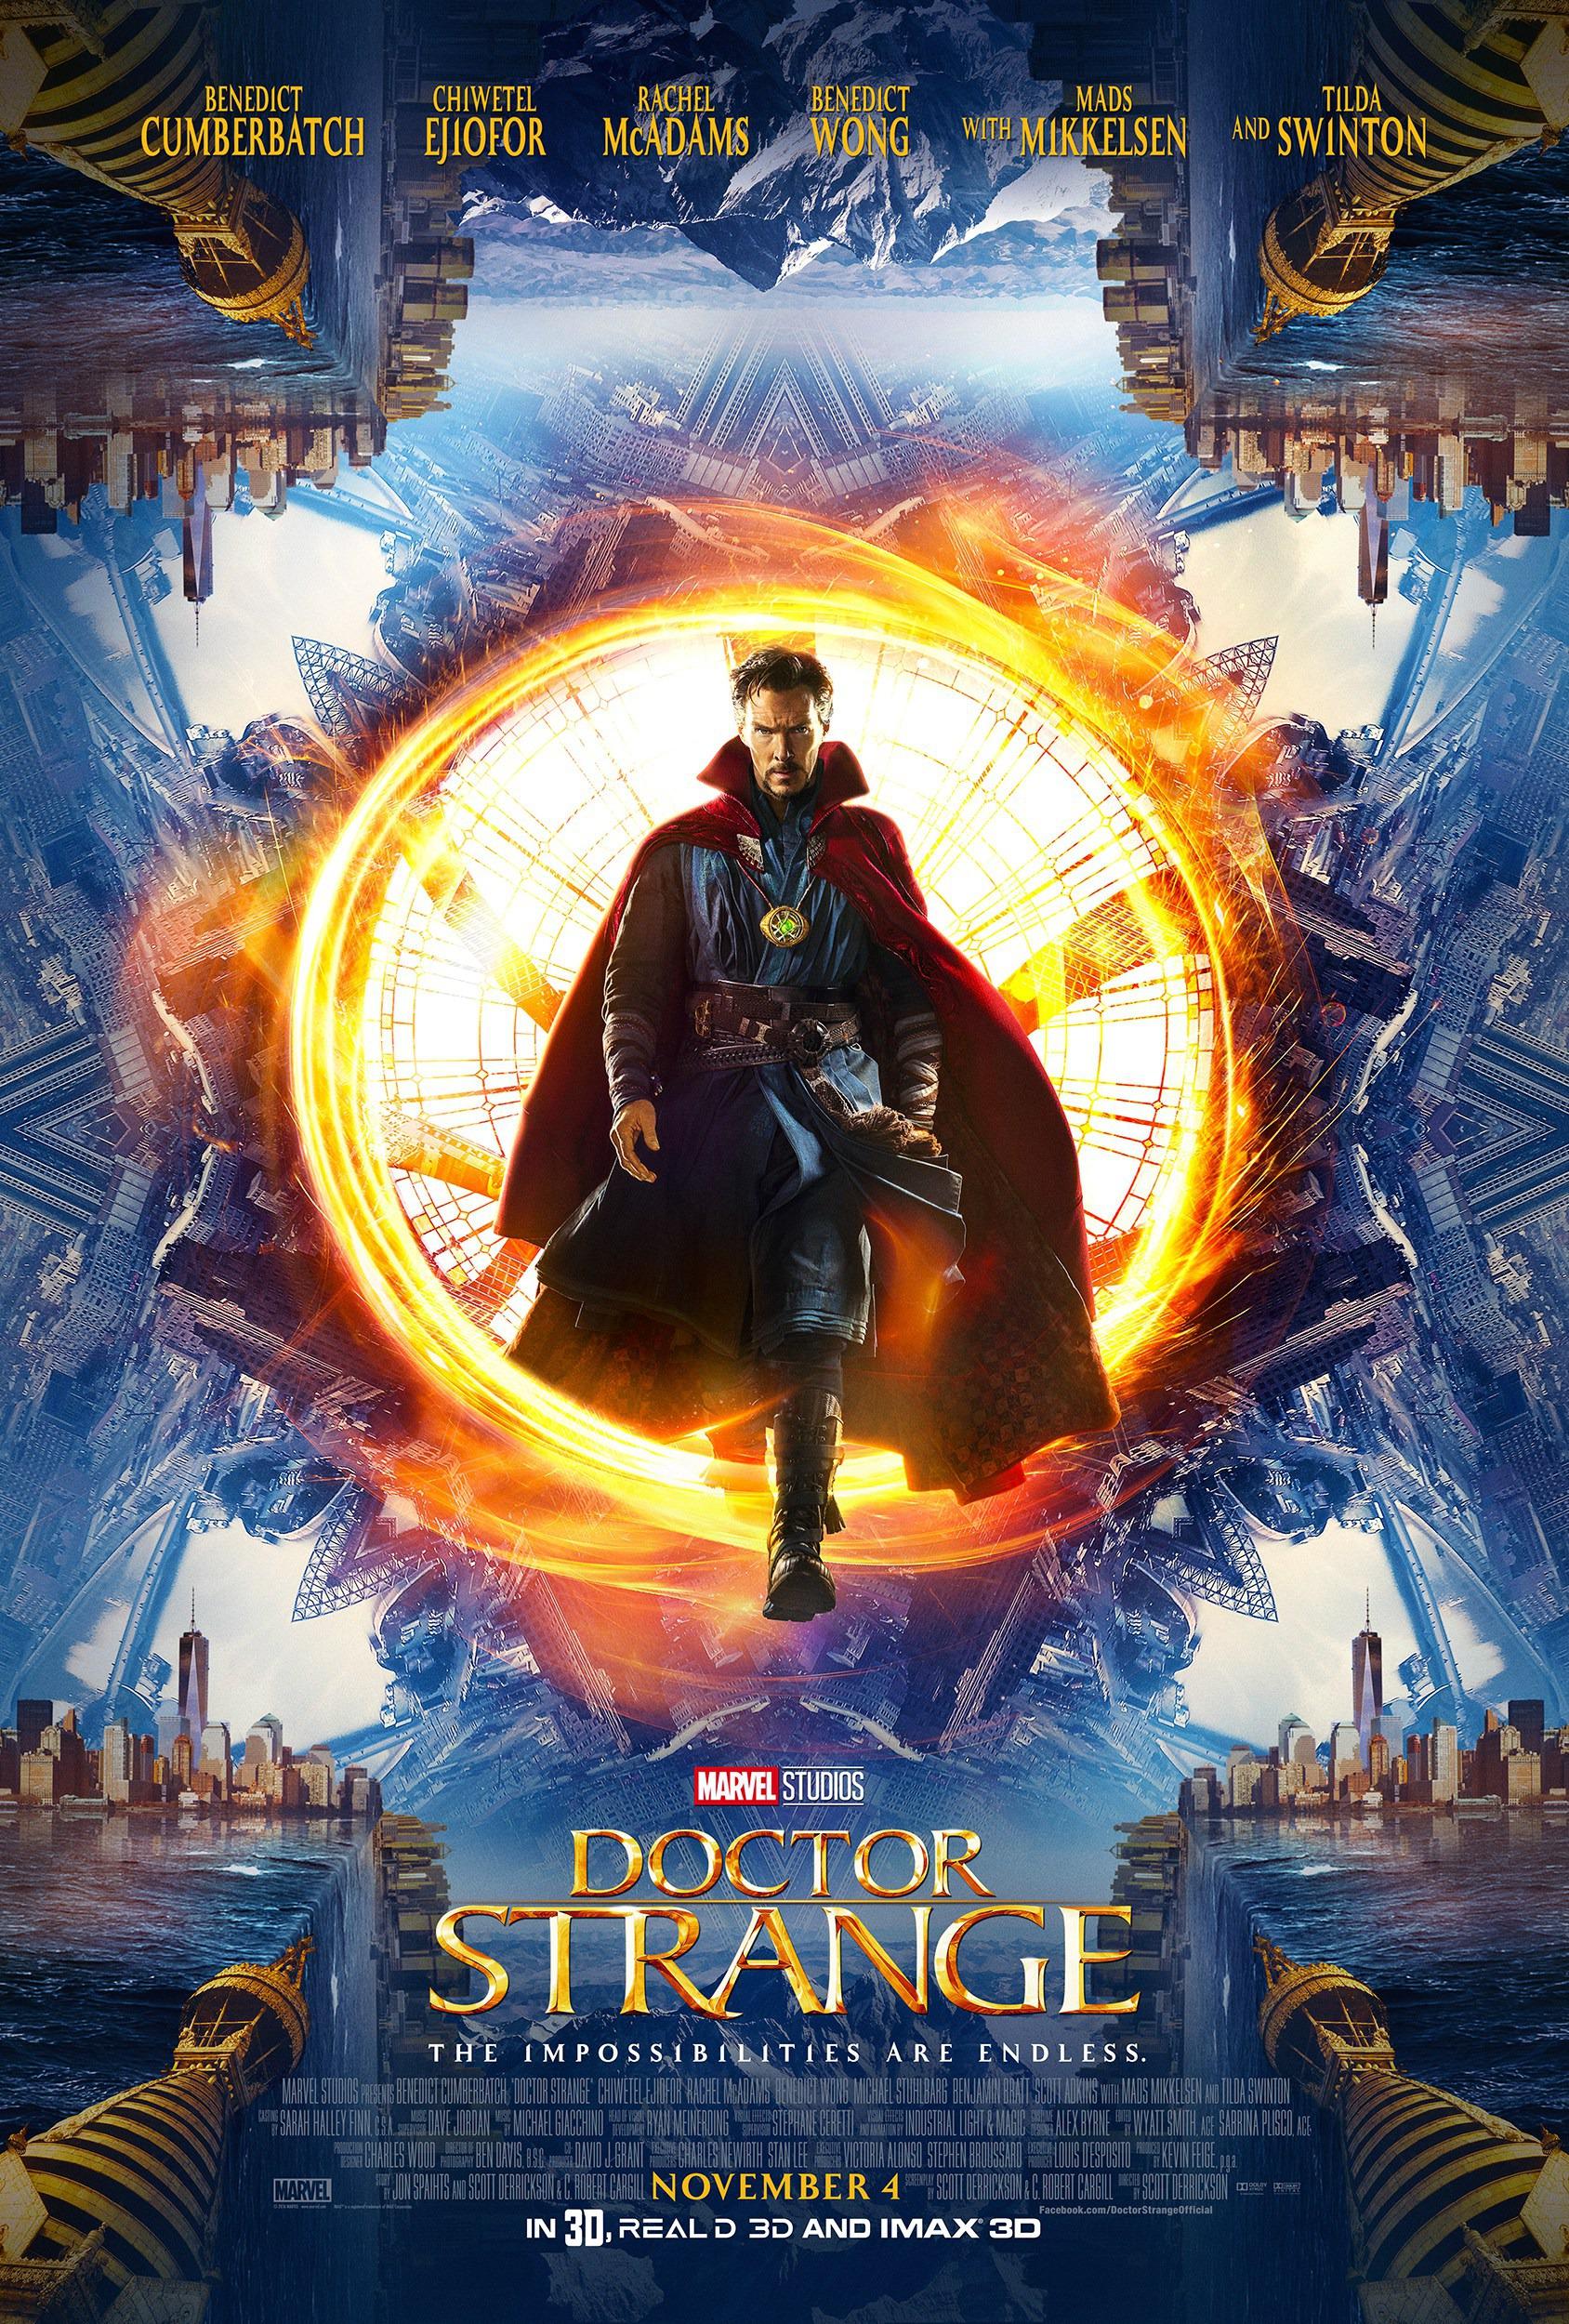 doctor-strange-movie-poster-marvel-cinematic-universe-1038908